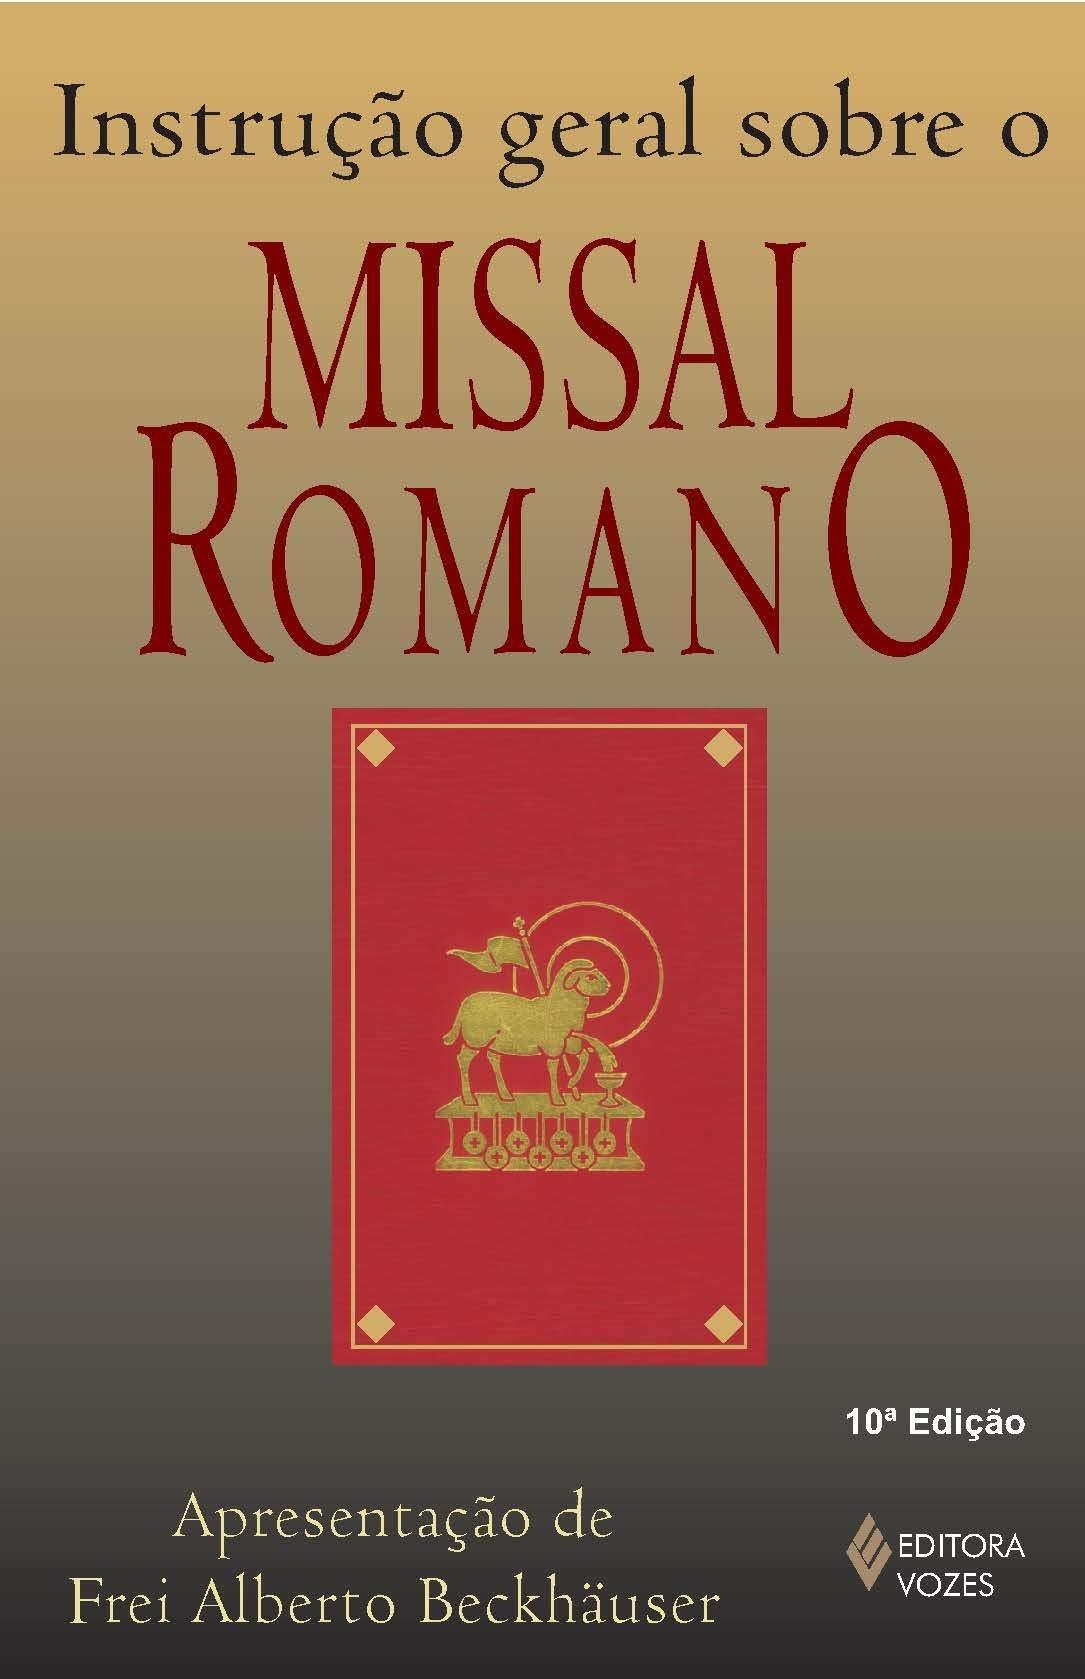 instrucao-geral-sobre-o-missal-romano